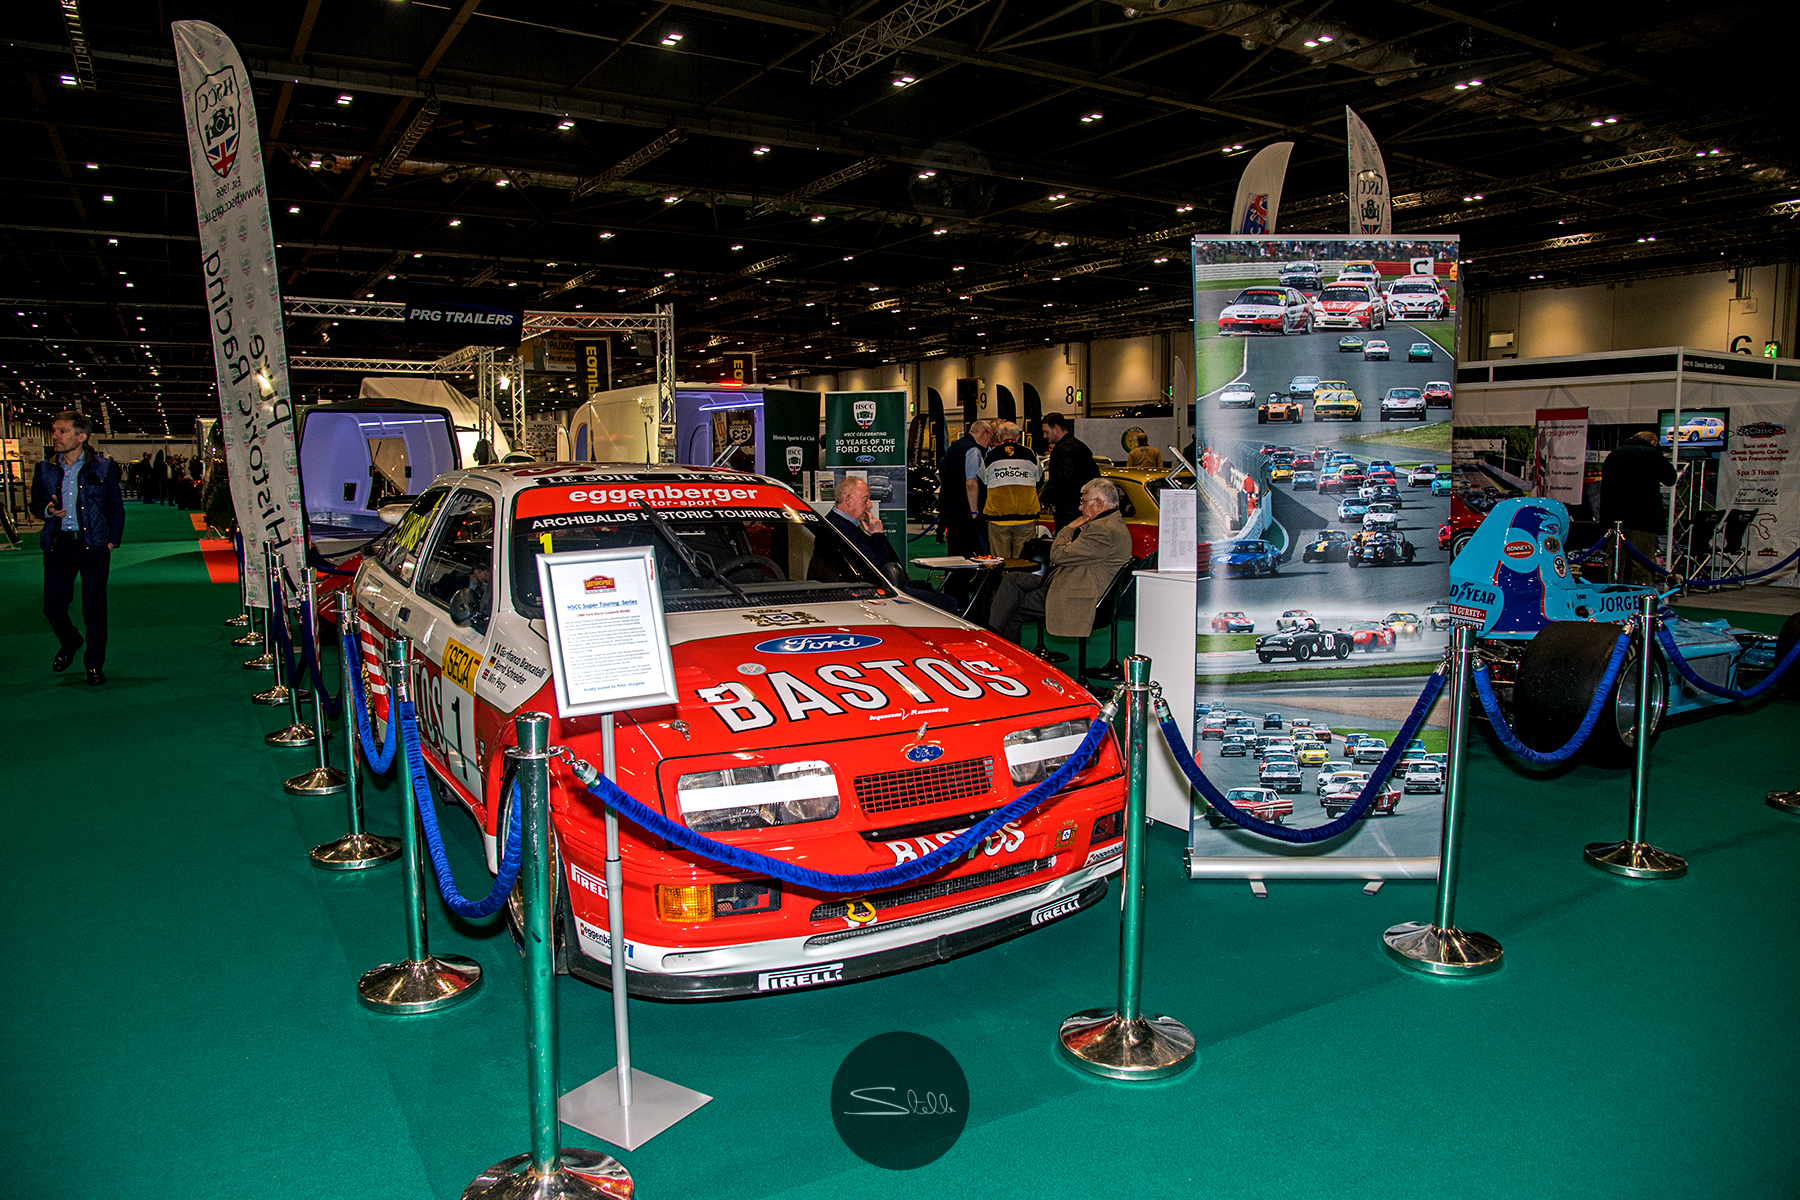 Stella Scordellis London Classic Car Show 2018 2 Watermarked.jpg